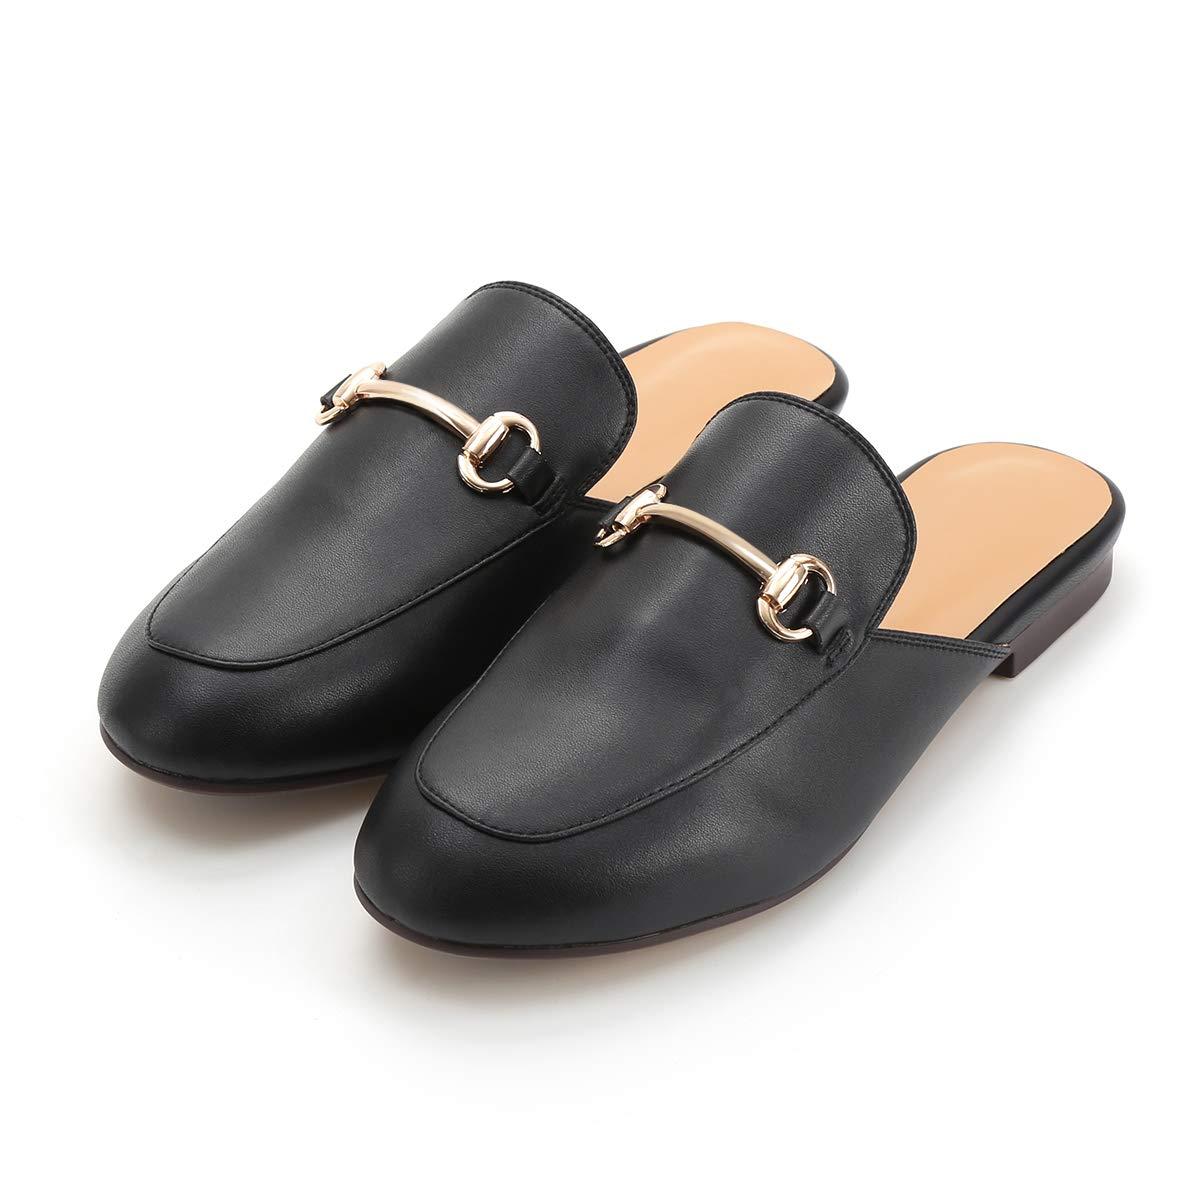 e4d41c92 Amazon.com | LaRosa Womens Leather Oxford Backless Slipper Slip-ons ...